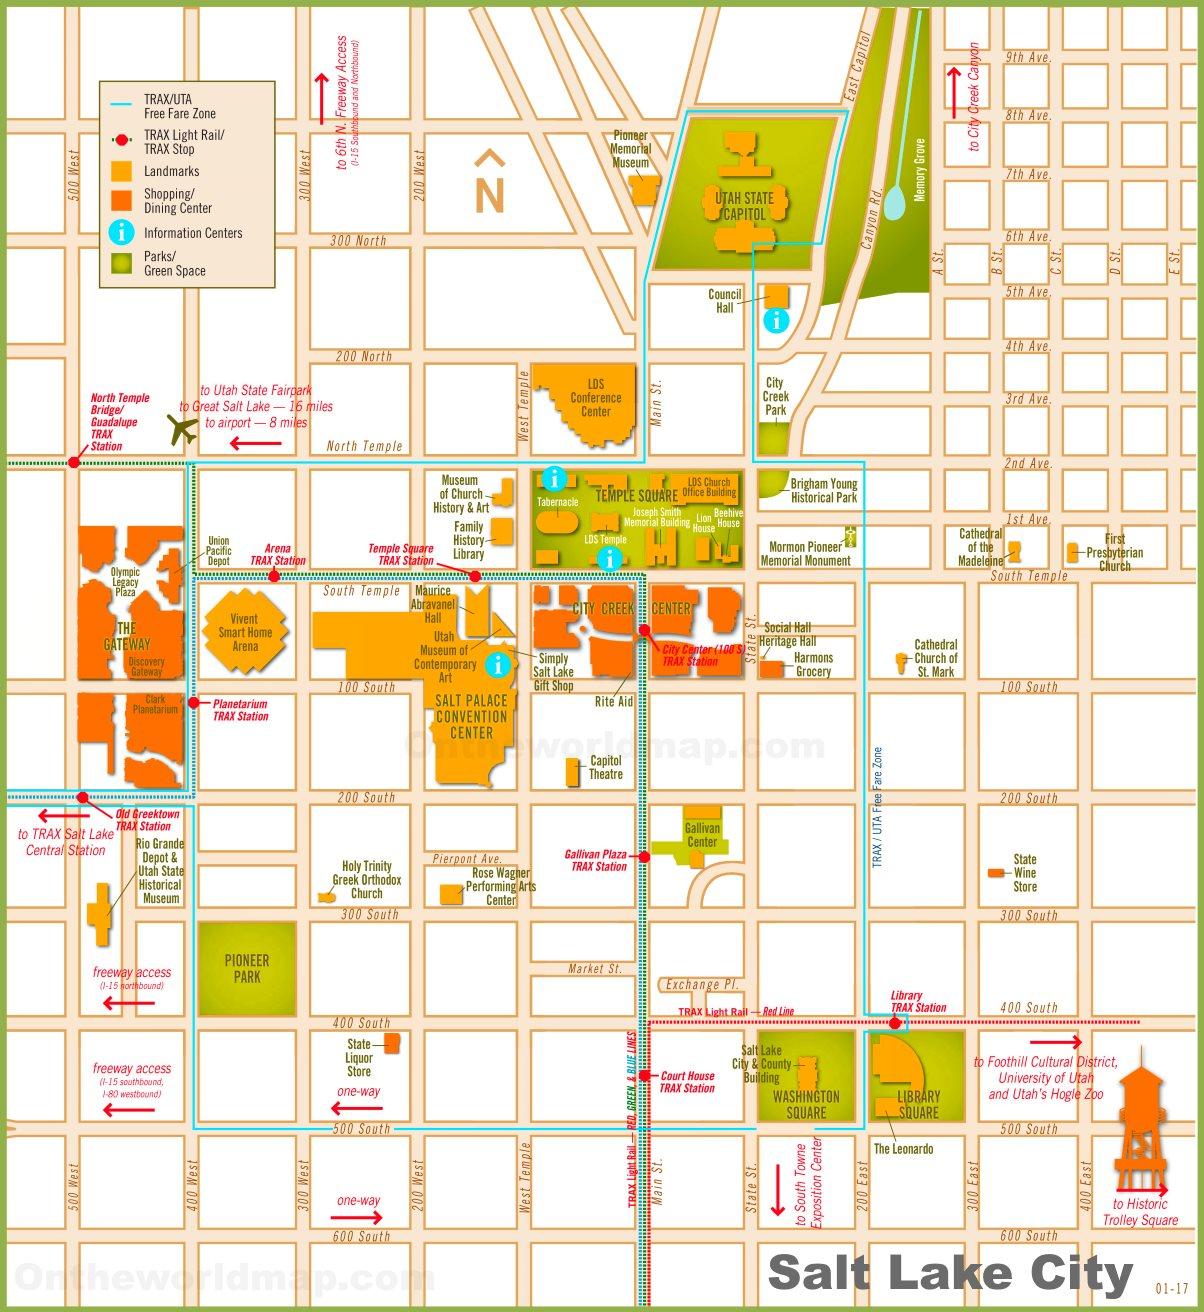 Salt Lake City tourist map Salt Lake City Map on san antonio map, denver map, north salt lake map, san francisco map, herriman map, oklahoma map, spokane map, honolulu map, canada map, new orleans map, paris map, united states map, indianapolis map, utah map, salt lake valley map, sacramento map, independence map, omaha map, santa fe map, salt lake county map,